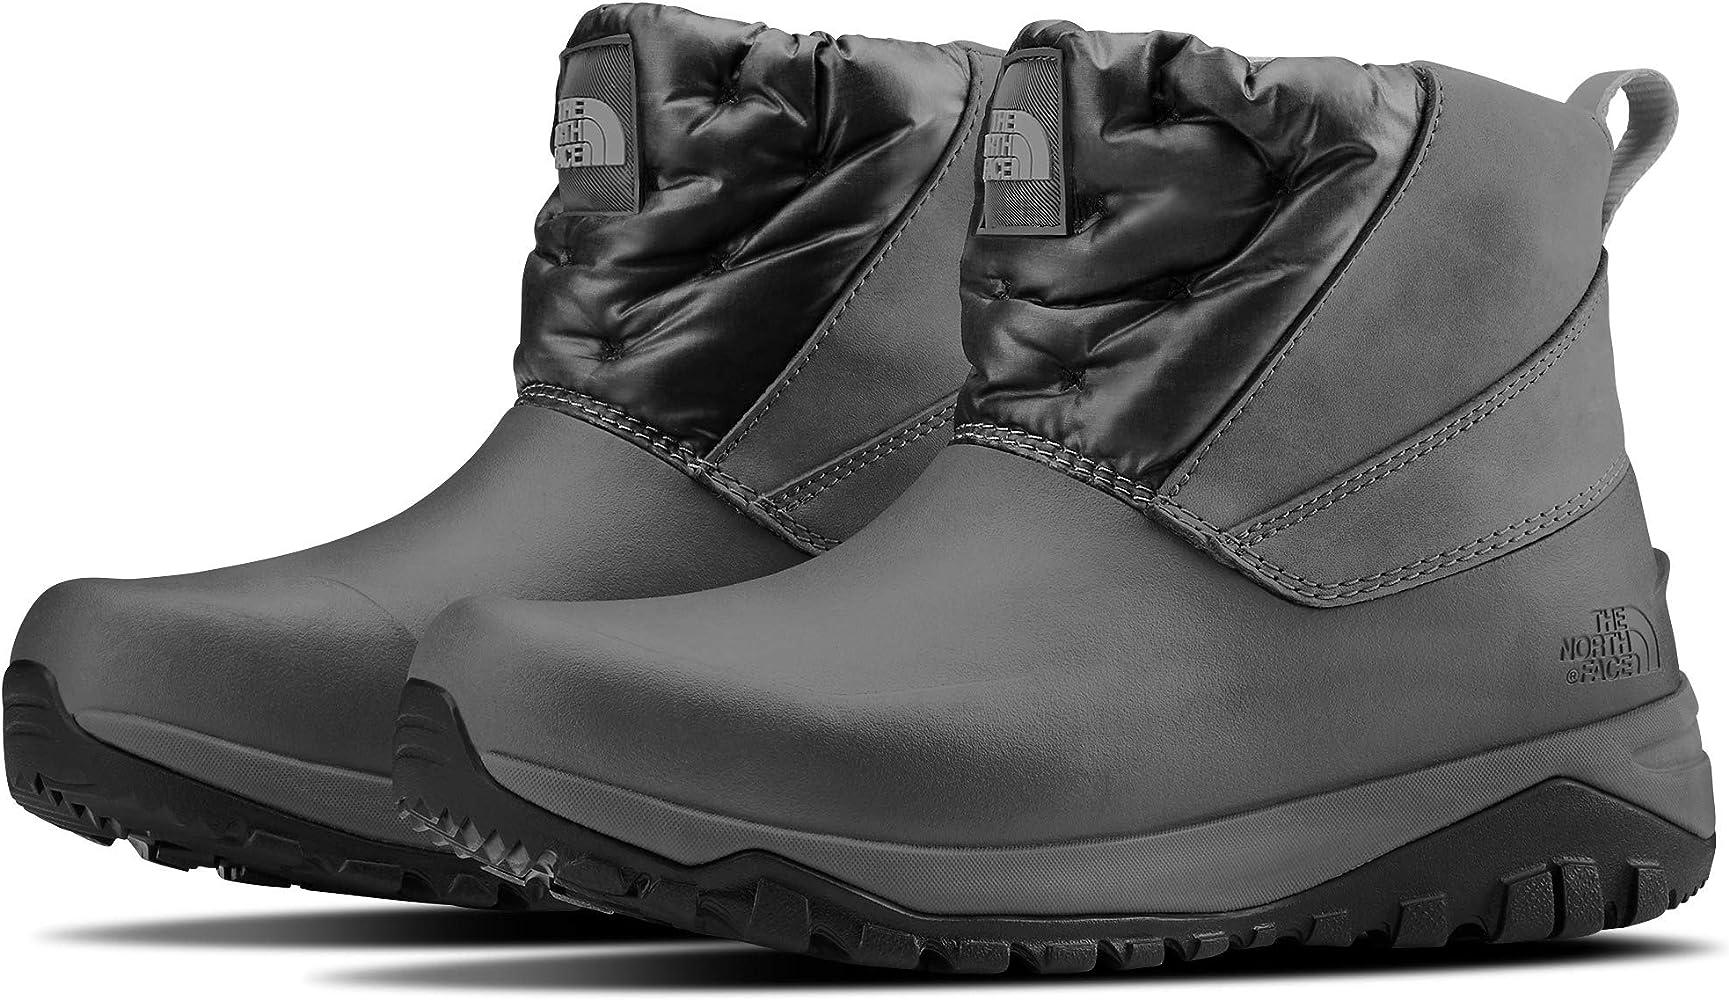 Yukiona Ankle Boot, Graphite Grey